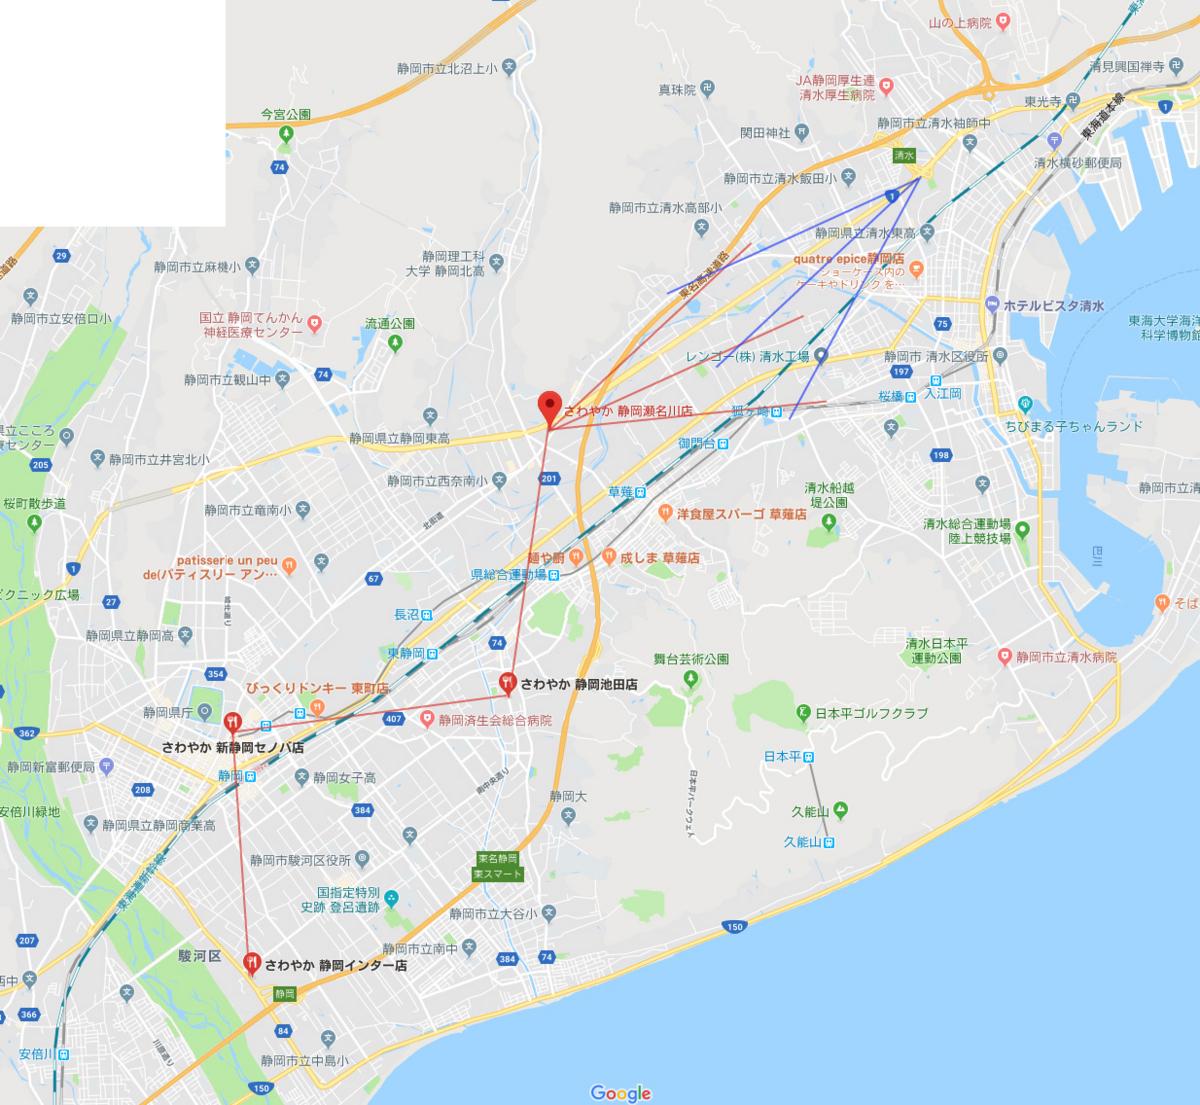 f:id:shimizu-minato:20180608160606j:plain